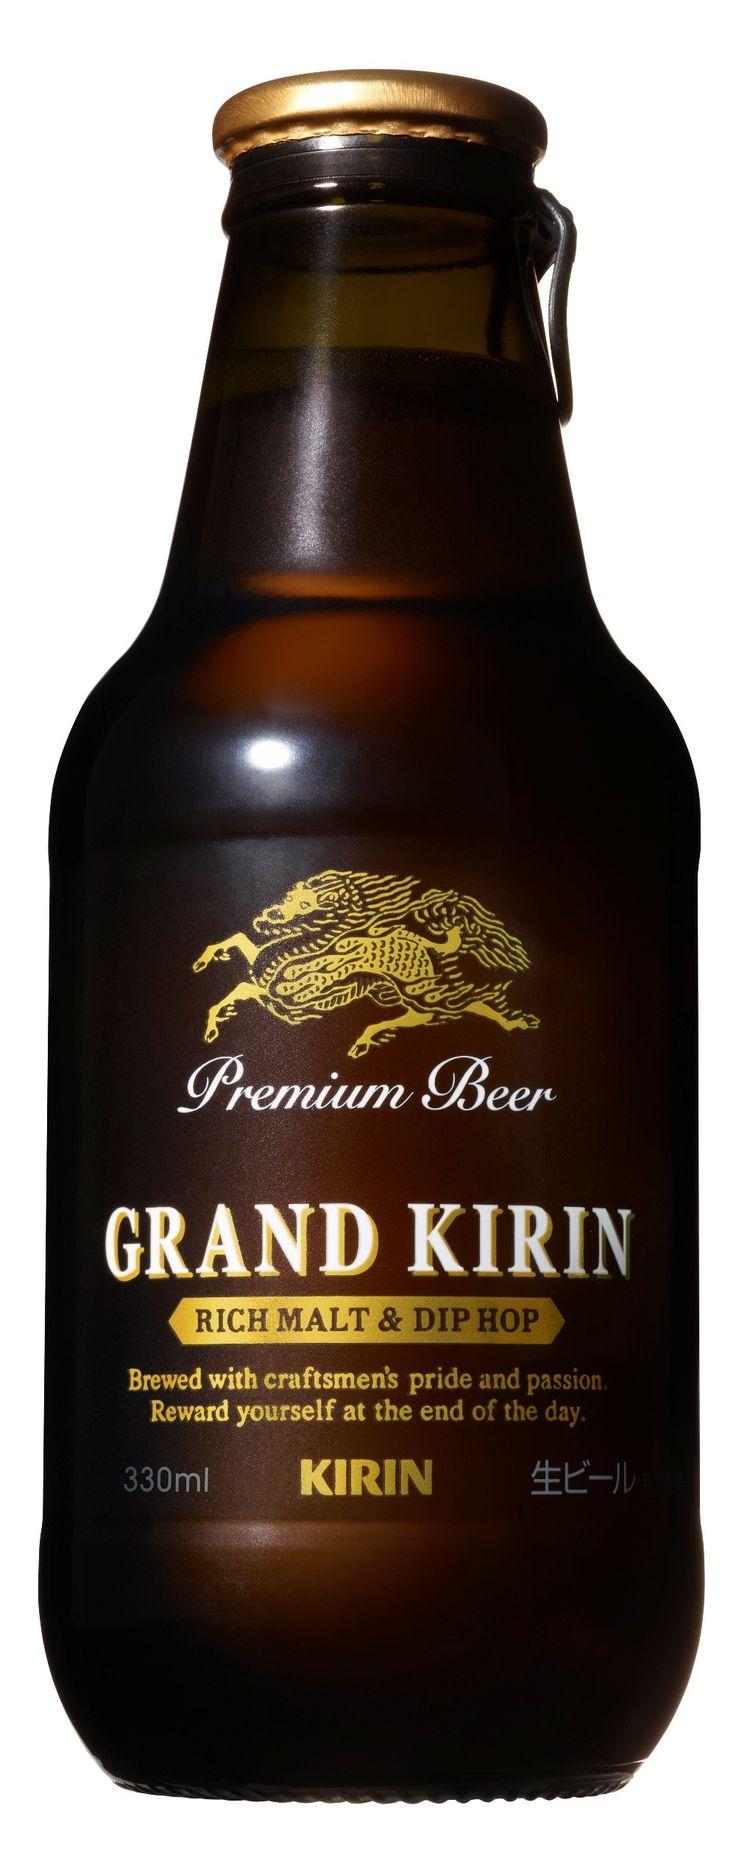 Home wine making and beer brewing recipes quality wine -  Premium Beer Grand Kirin Rich Malt Dip Hop